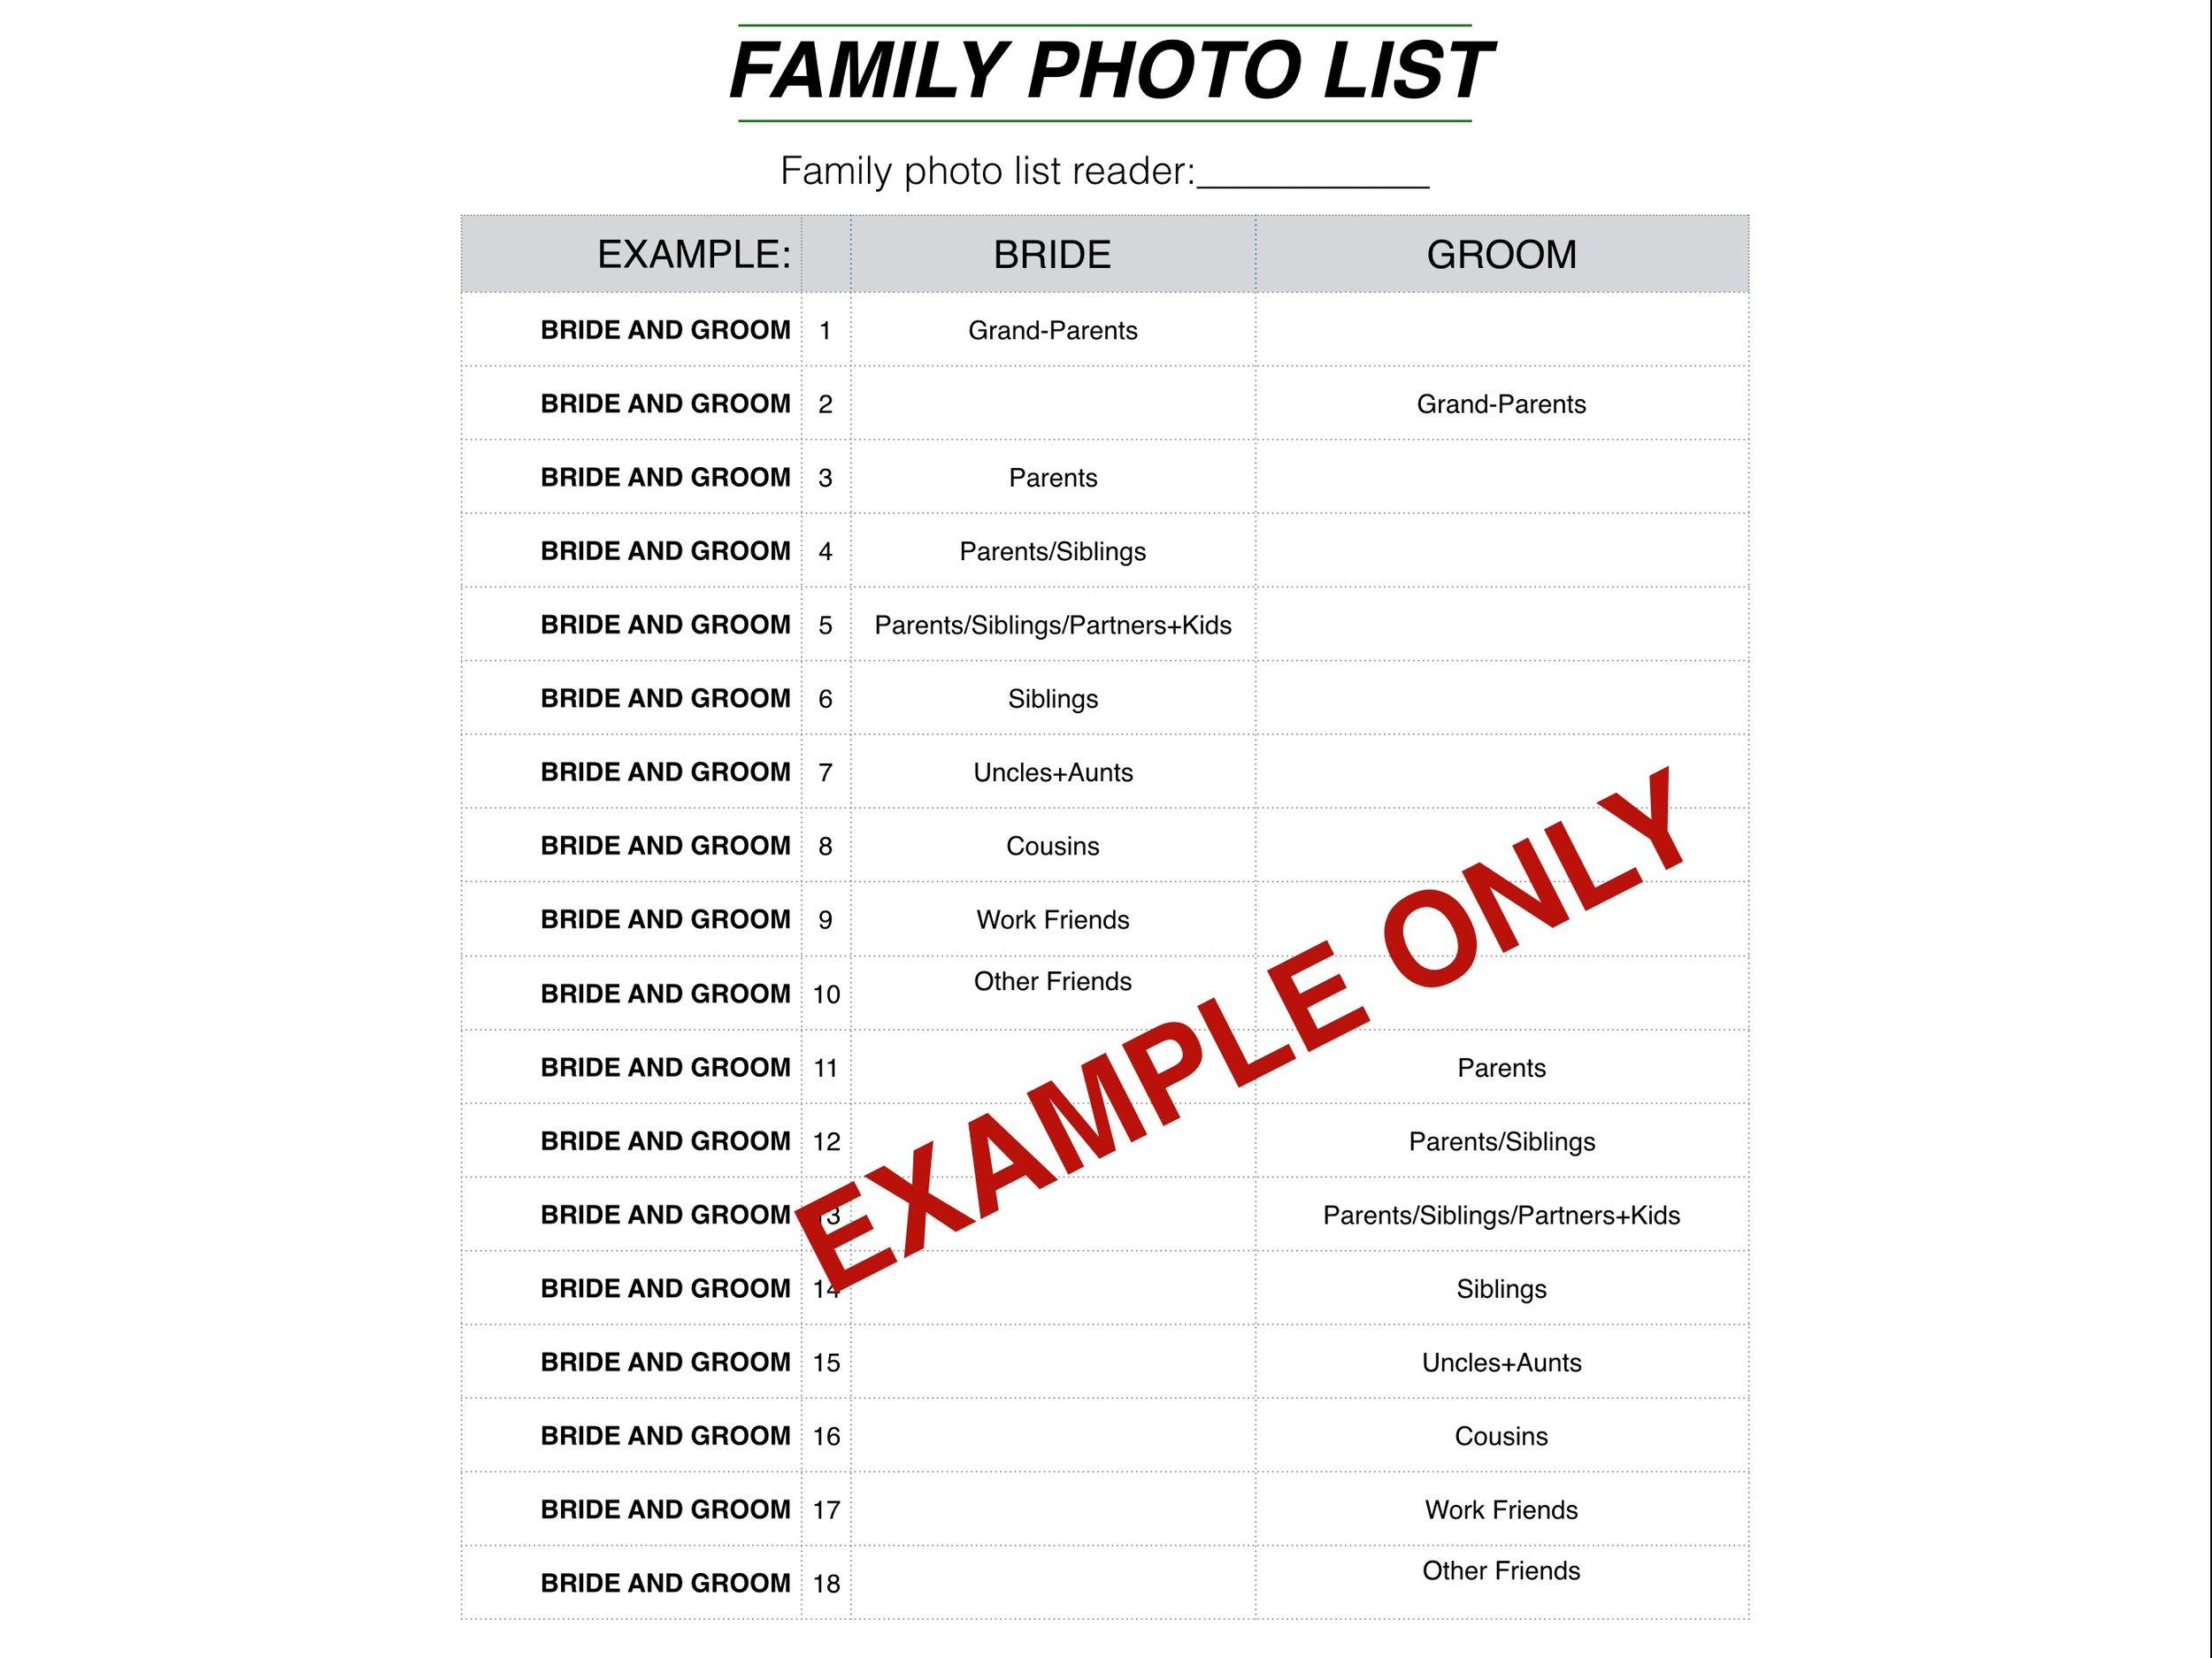 Family_Photo-List.jpg